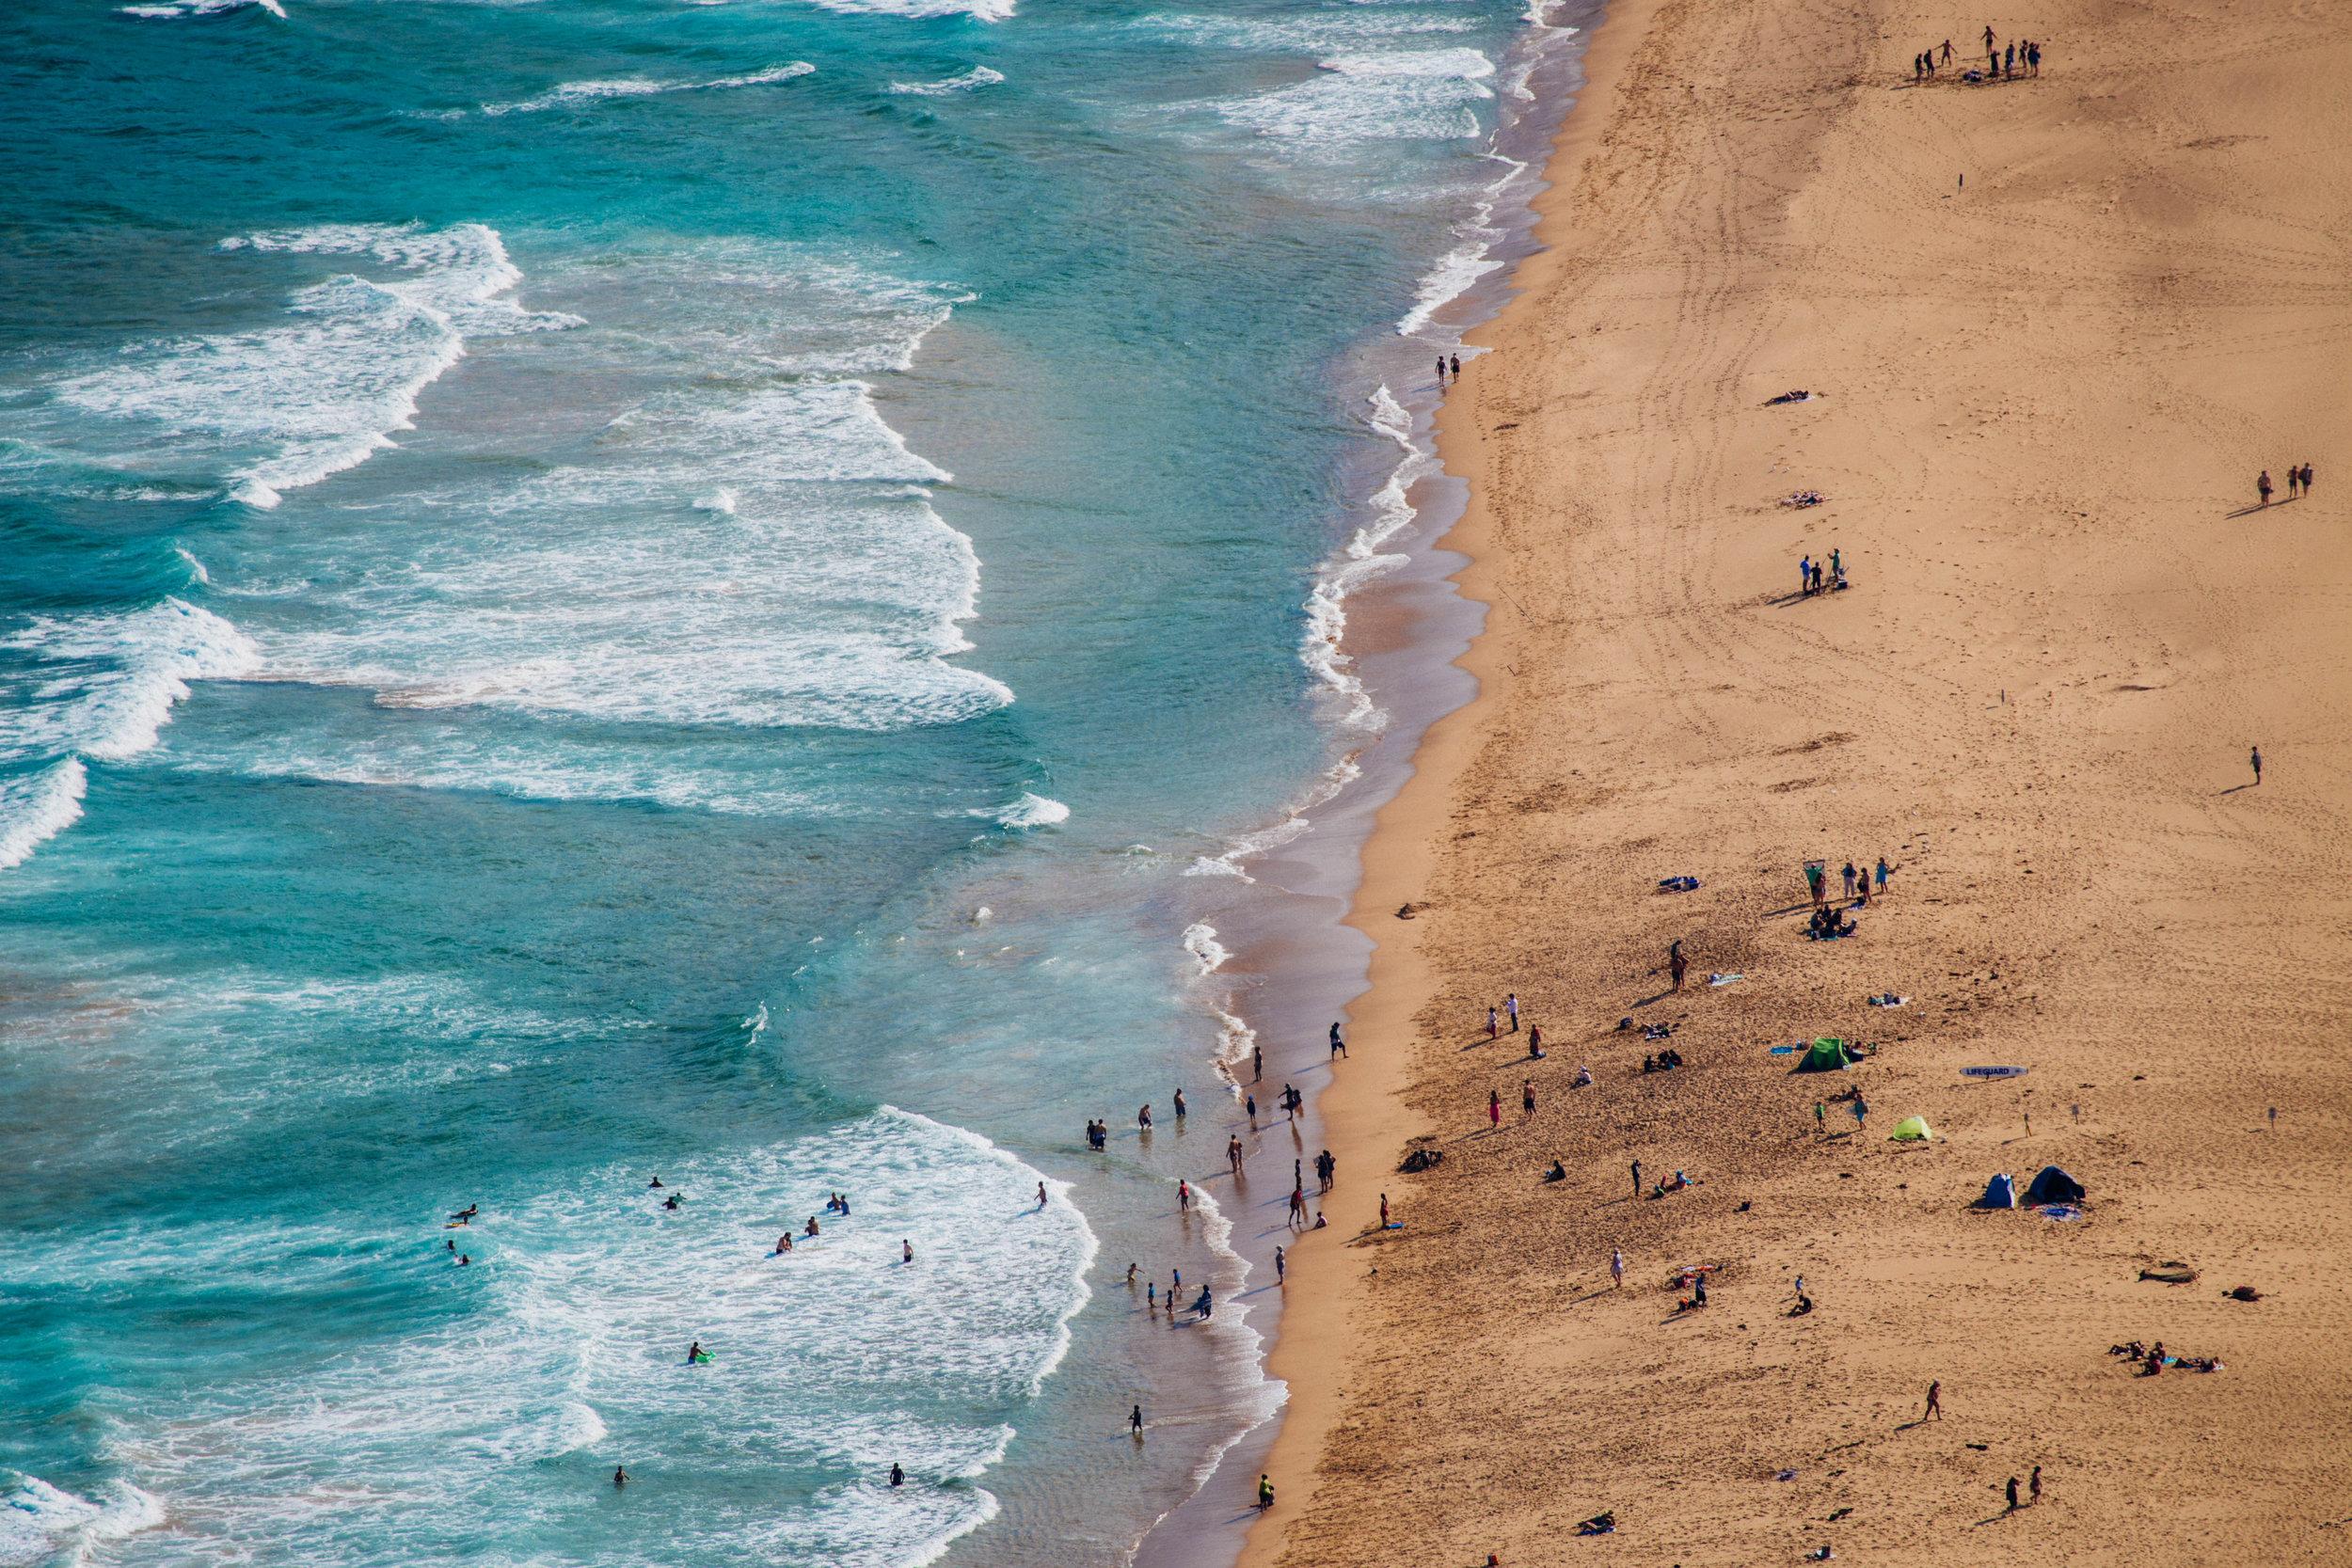 Around Australia - Travel Photography